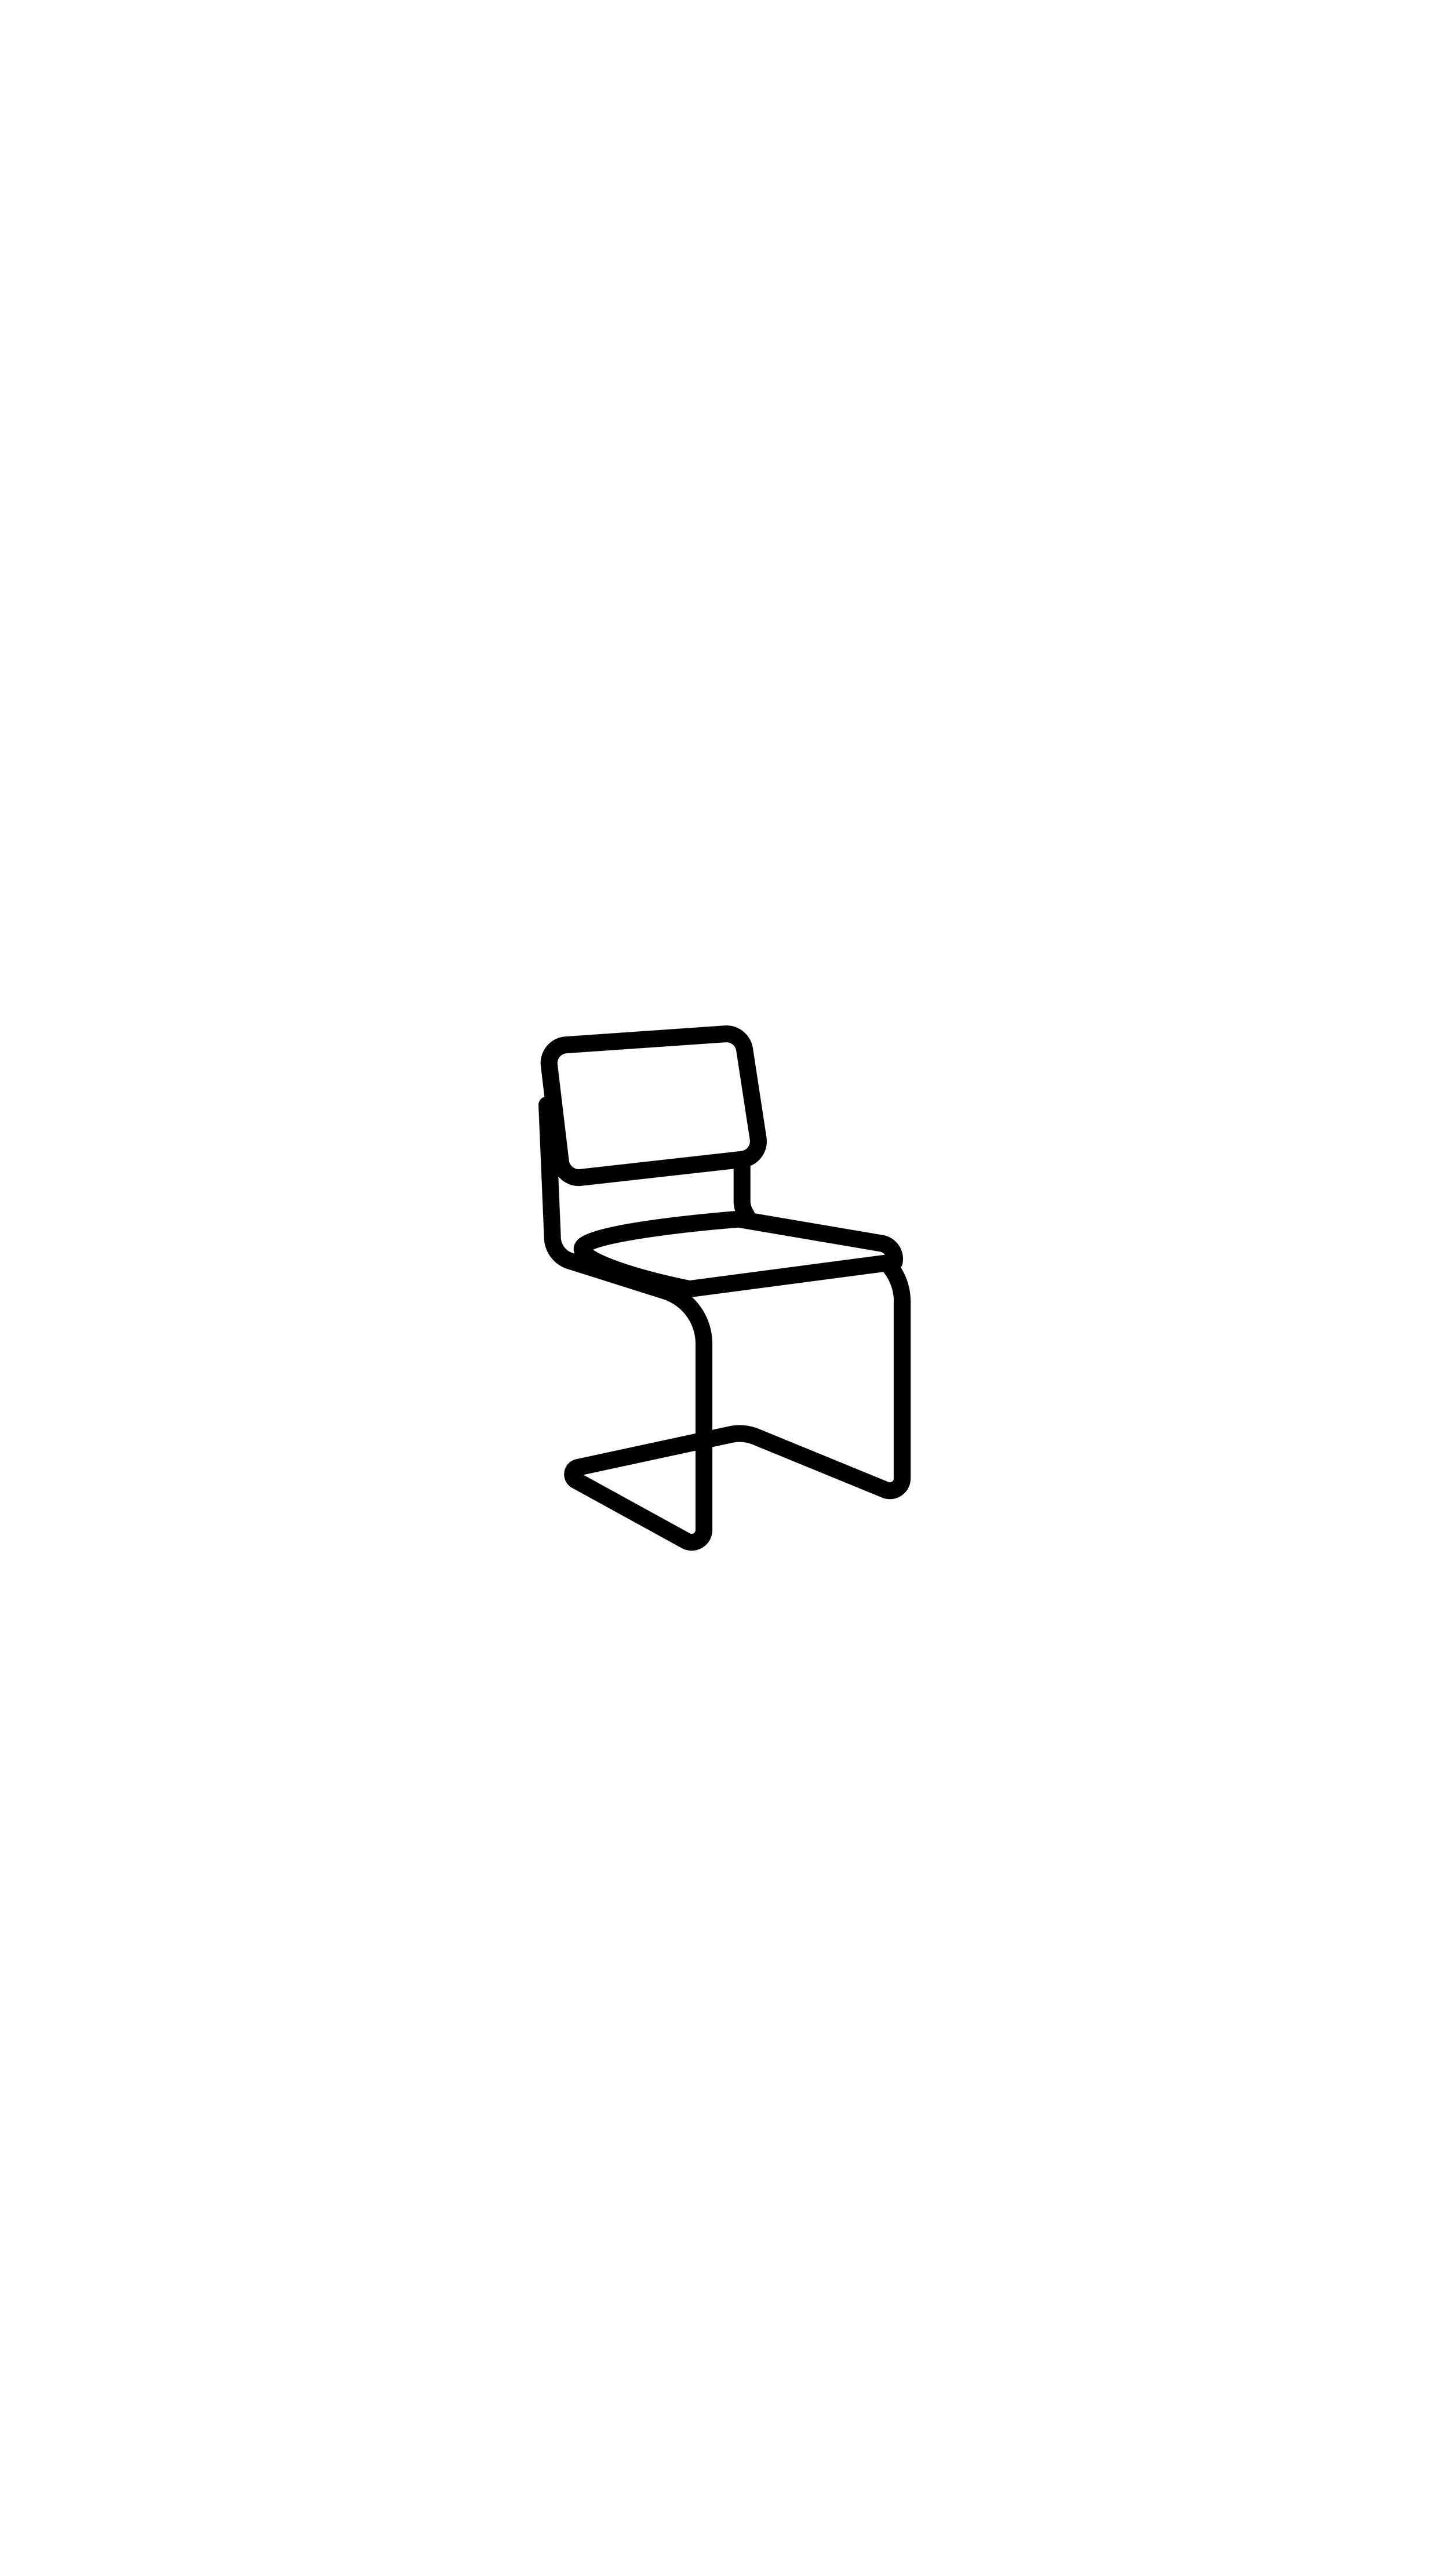 Cesca Chair, Thrift, Dining Chair